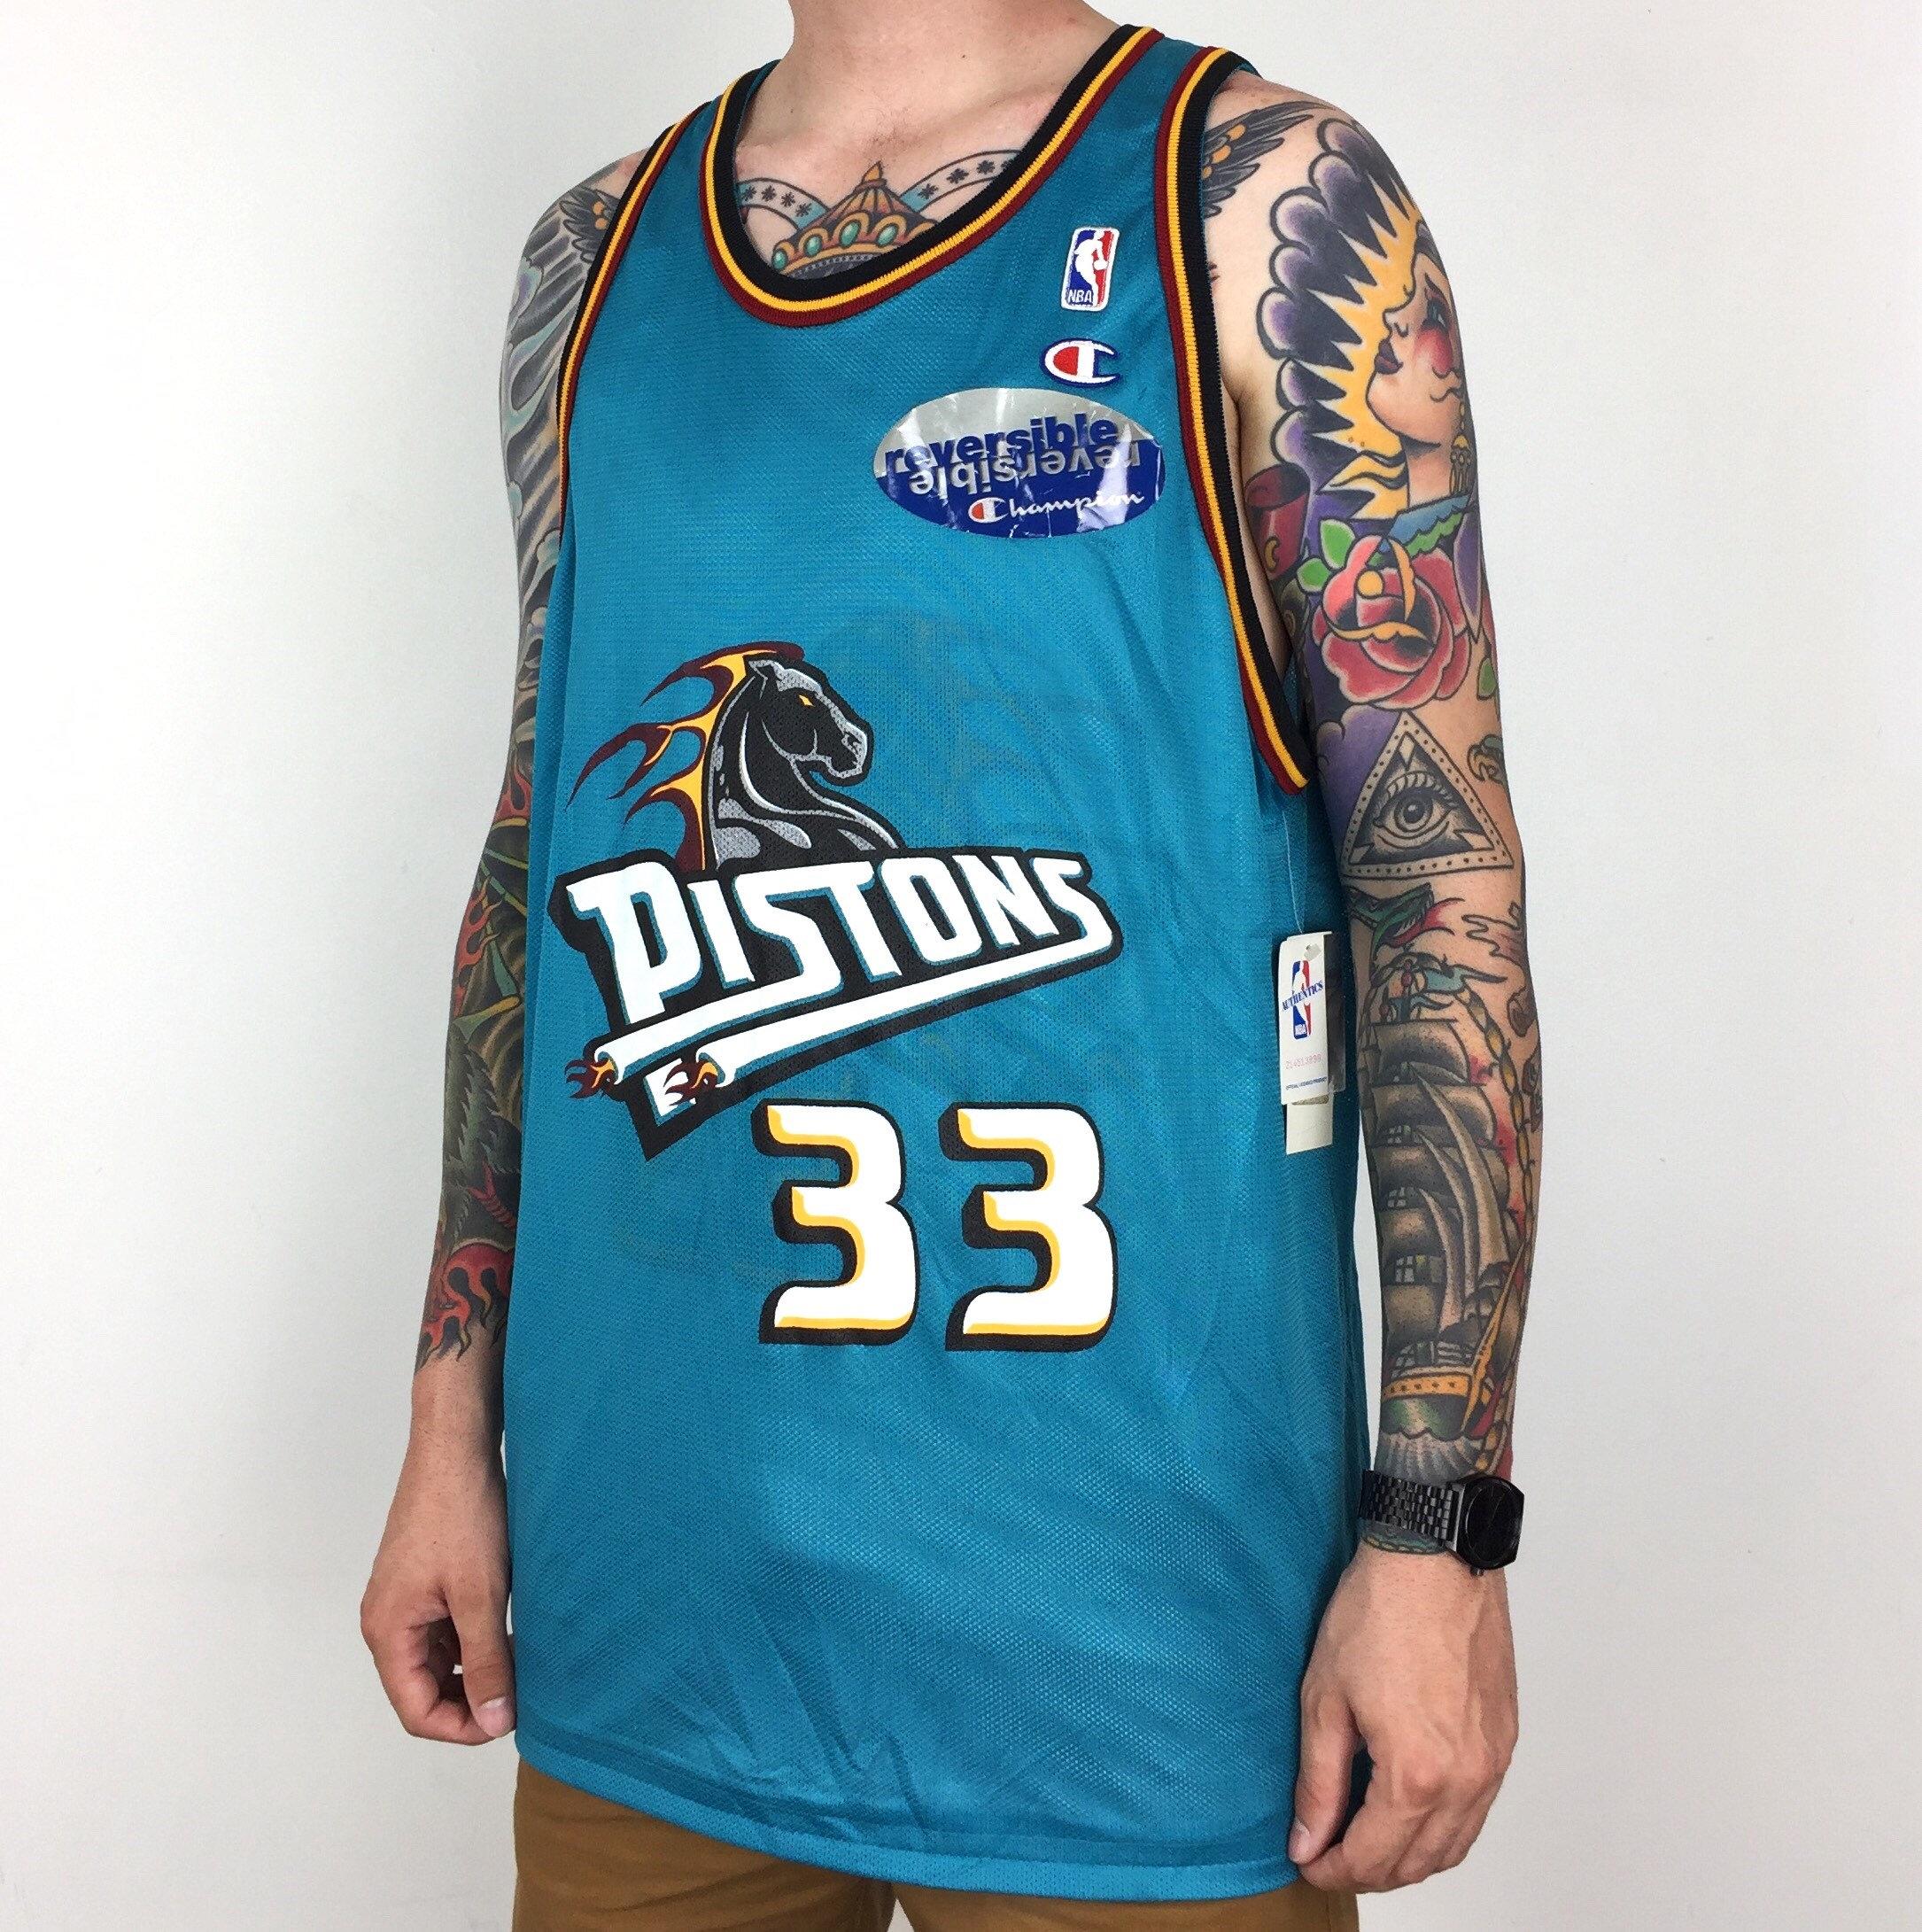 fa0f0a69e Rare Deadstock NWT Vintage 90s Champion NBA Detroit Pistons Grant Hill  33  blue white reversible basketball jersey - Size 48   XL